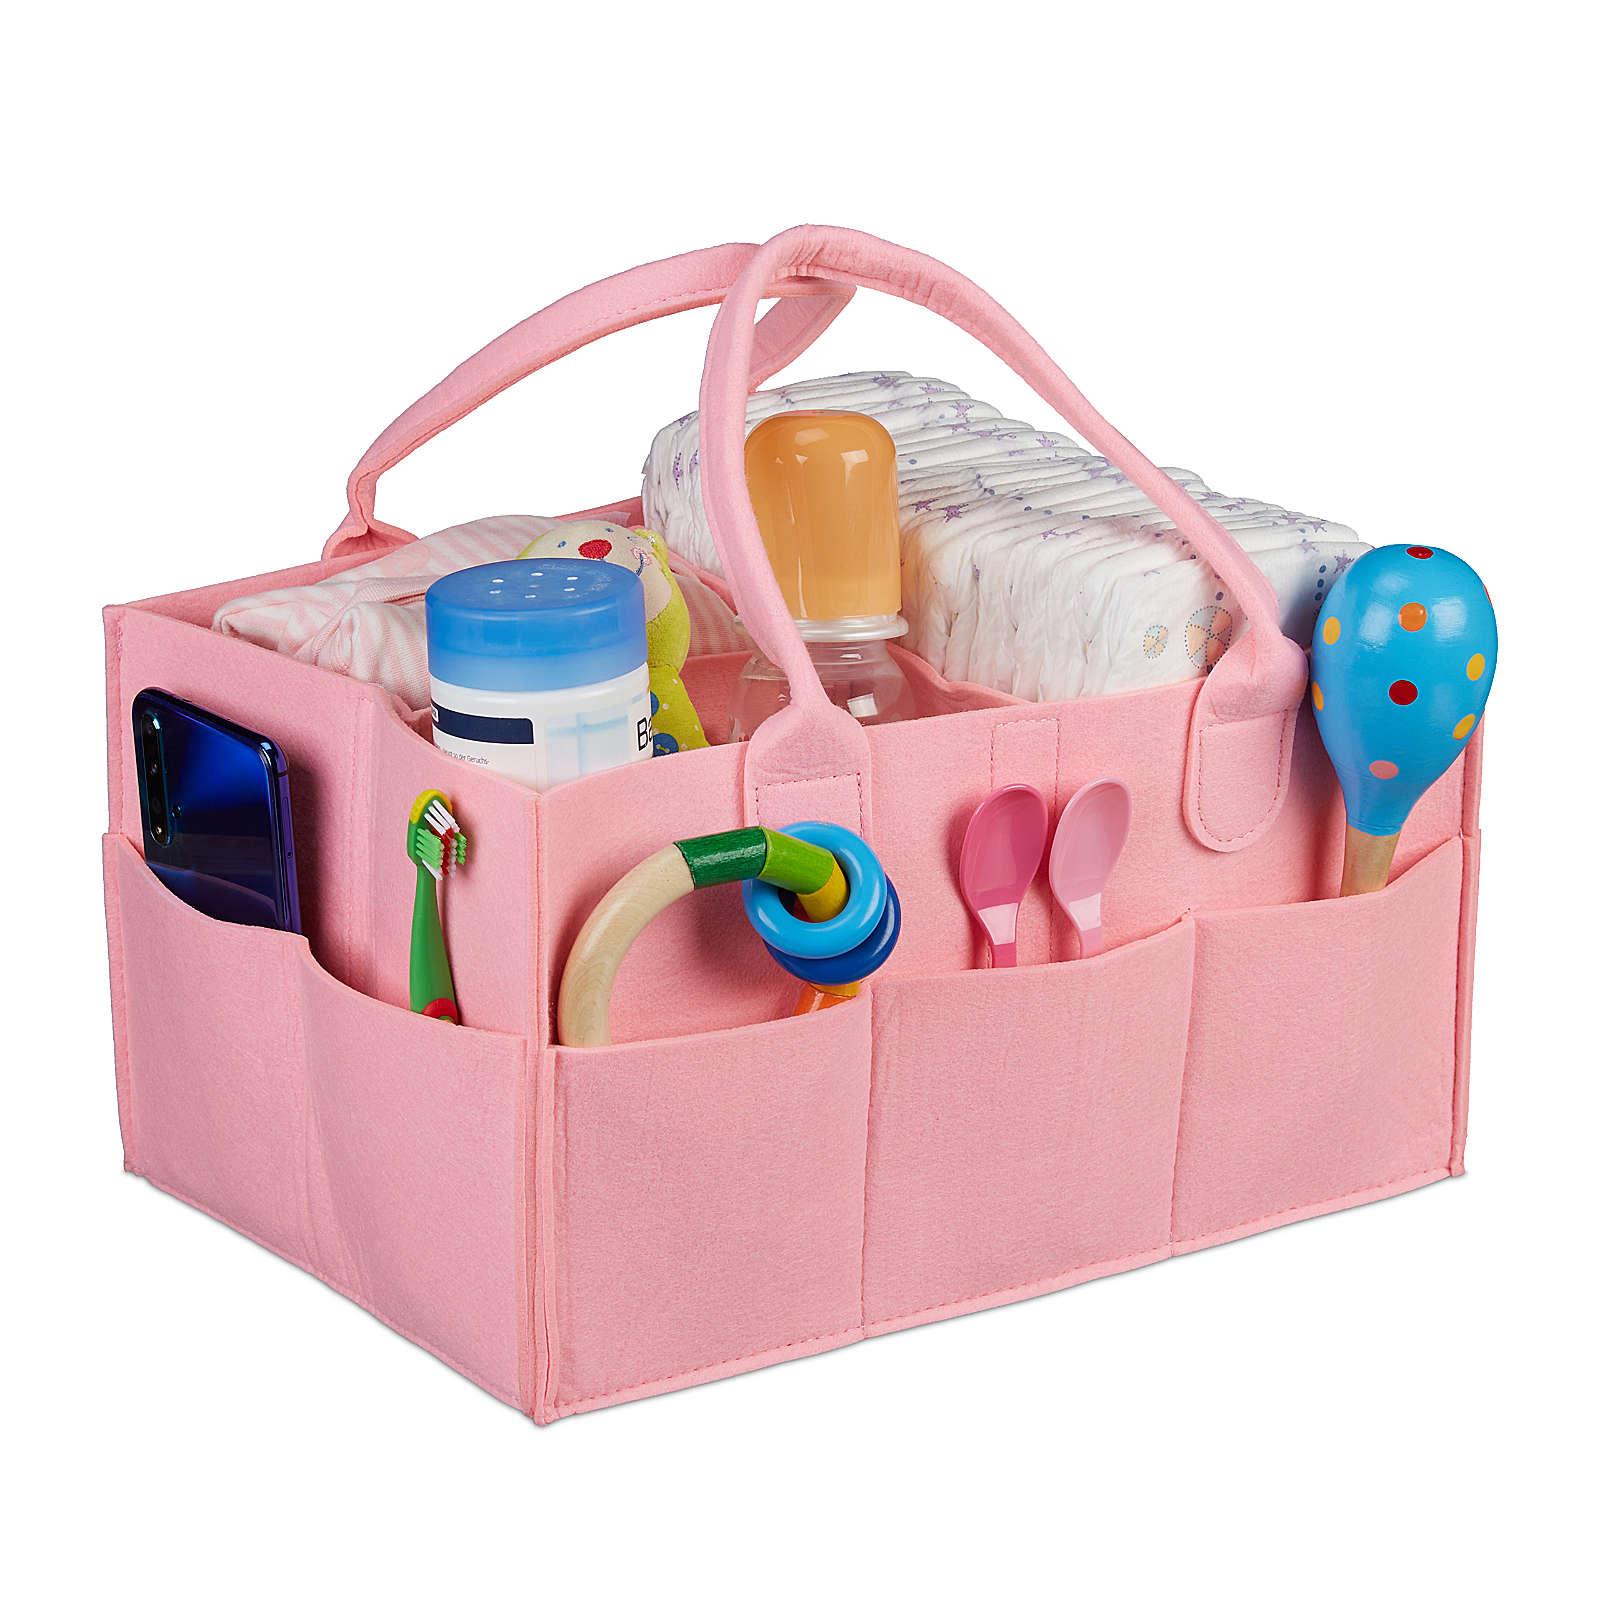 relaxdays Baby Windel Caddy bunt rosa